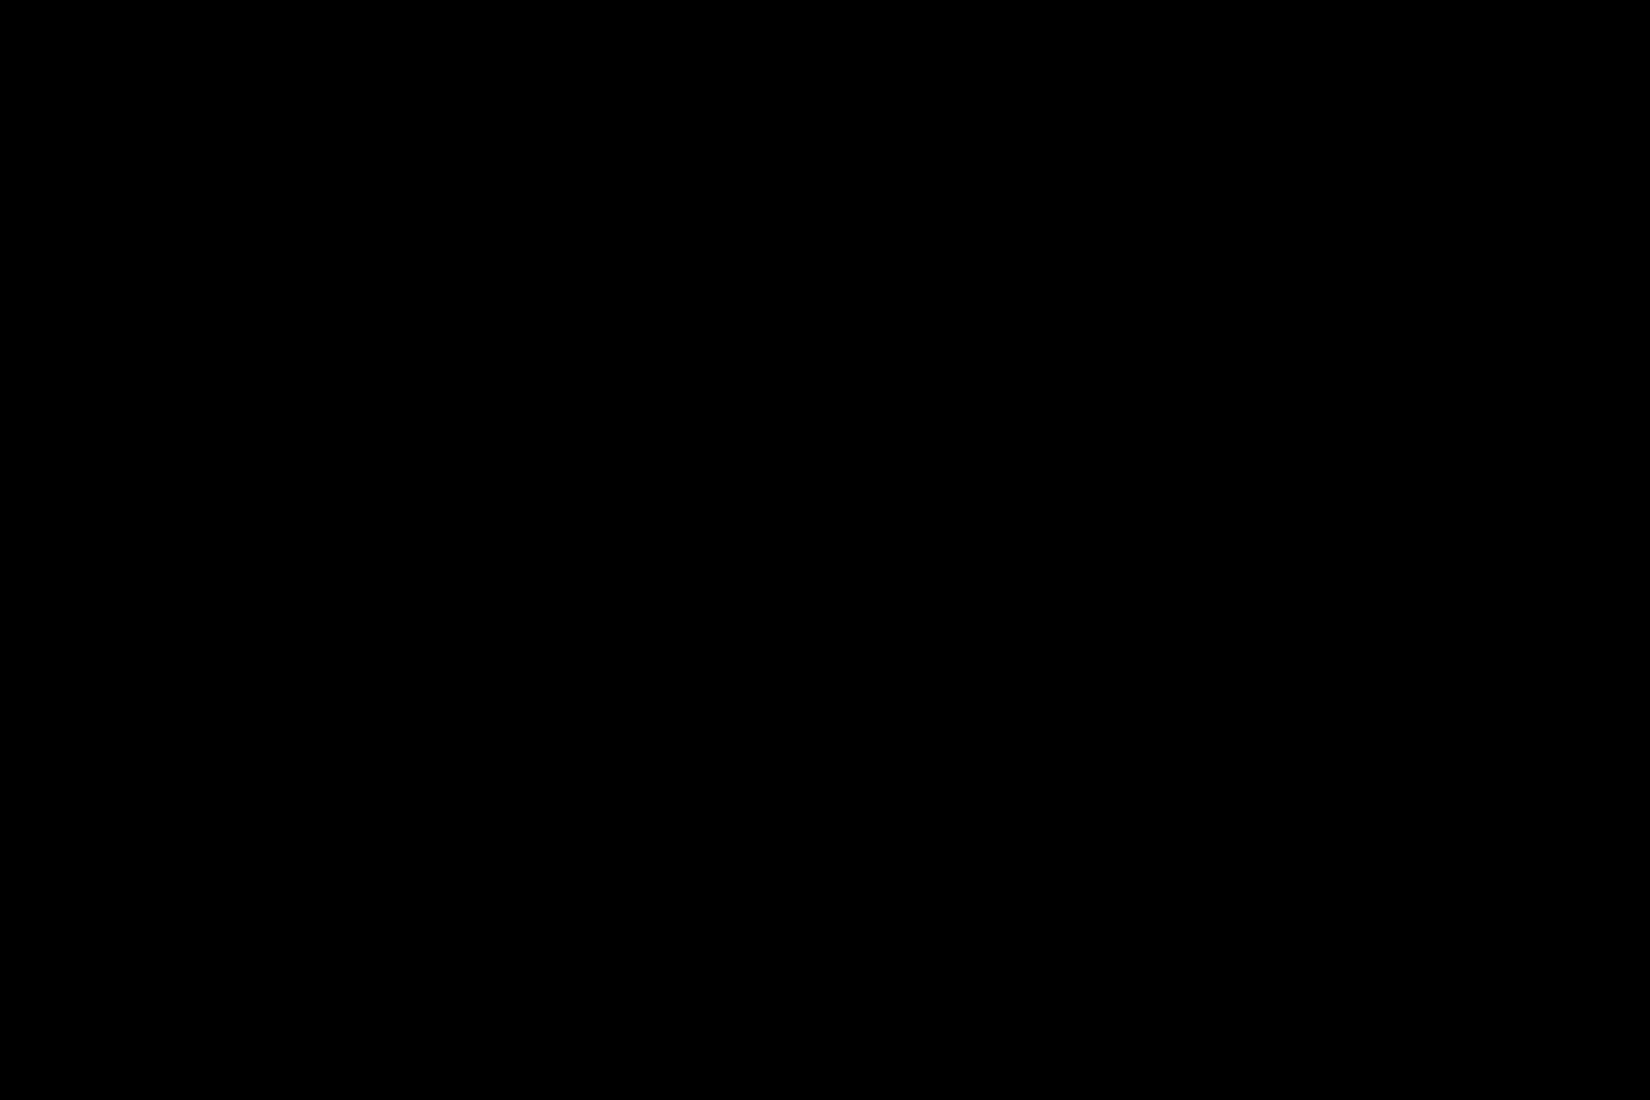 hnck8404